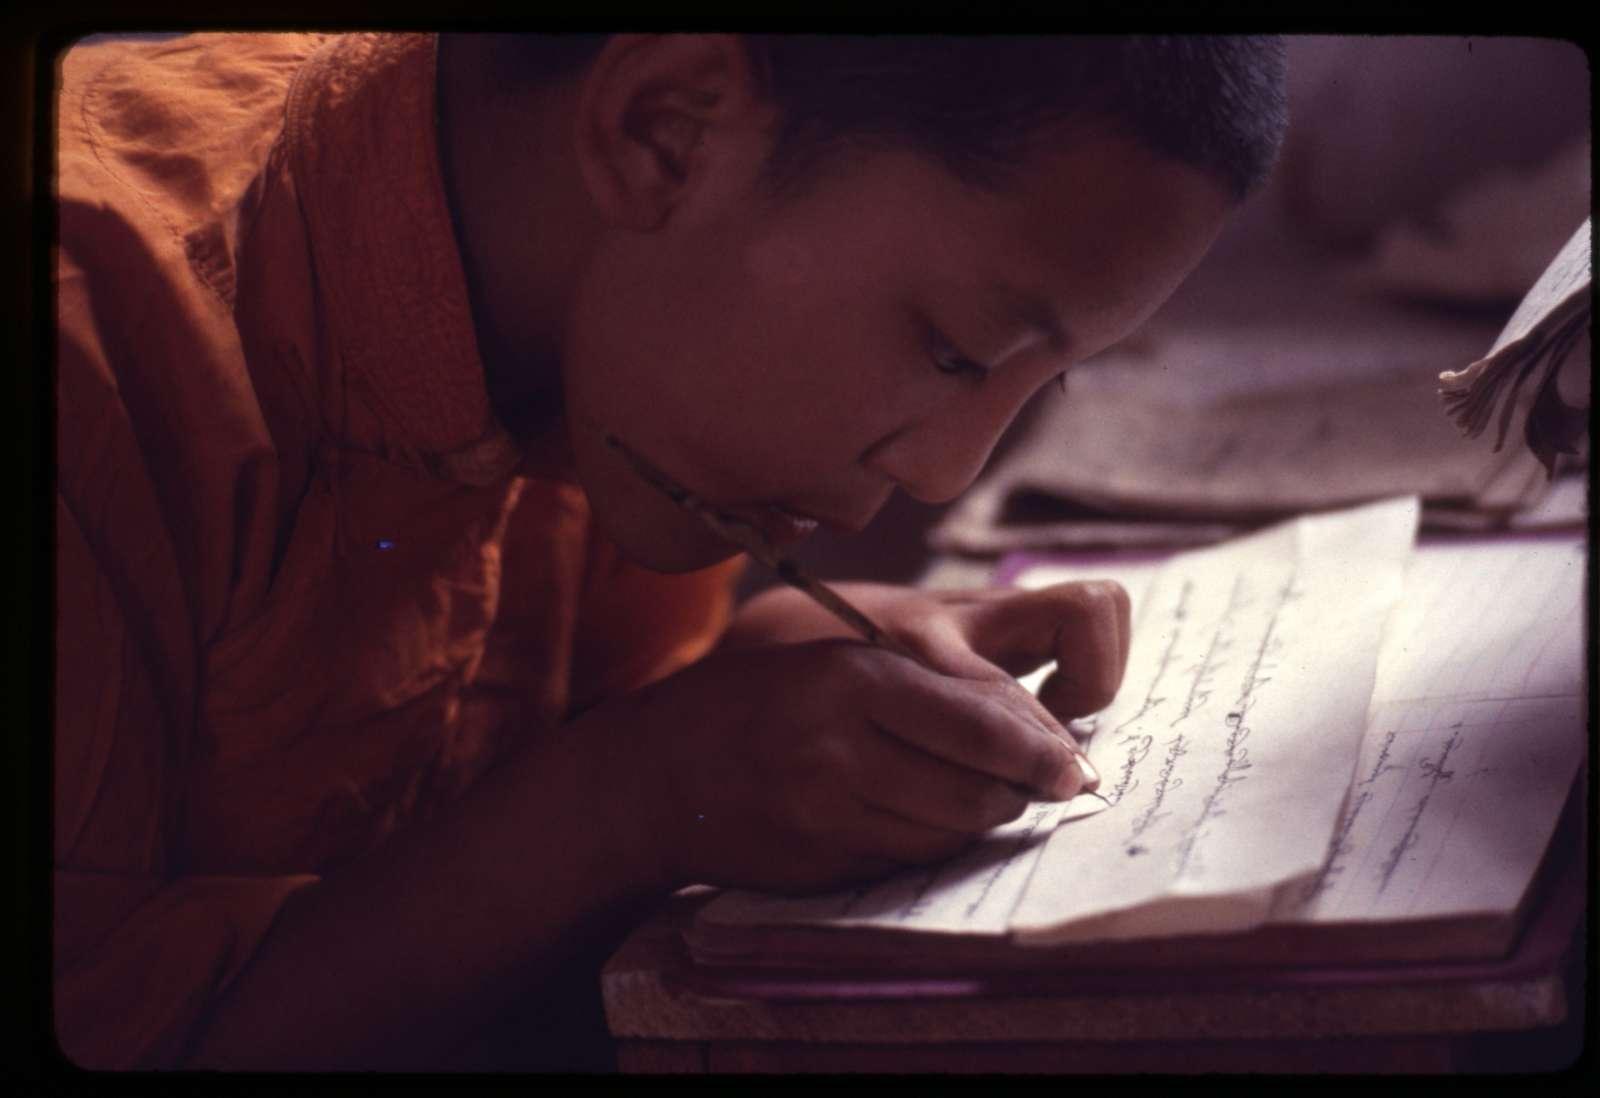 [Karmapa Lama's successor studying penmanship, Sikkim]